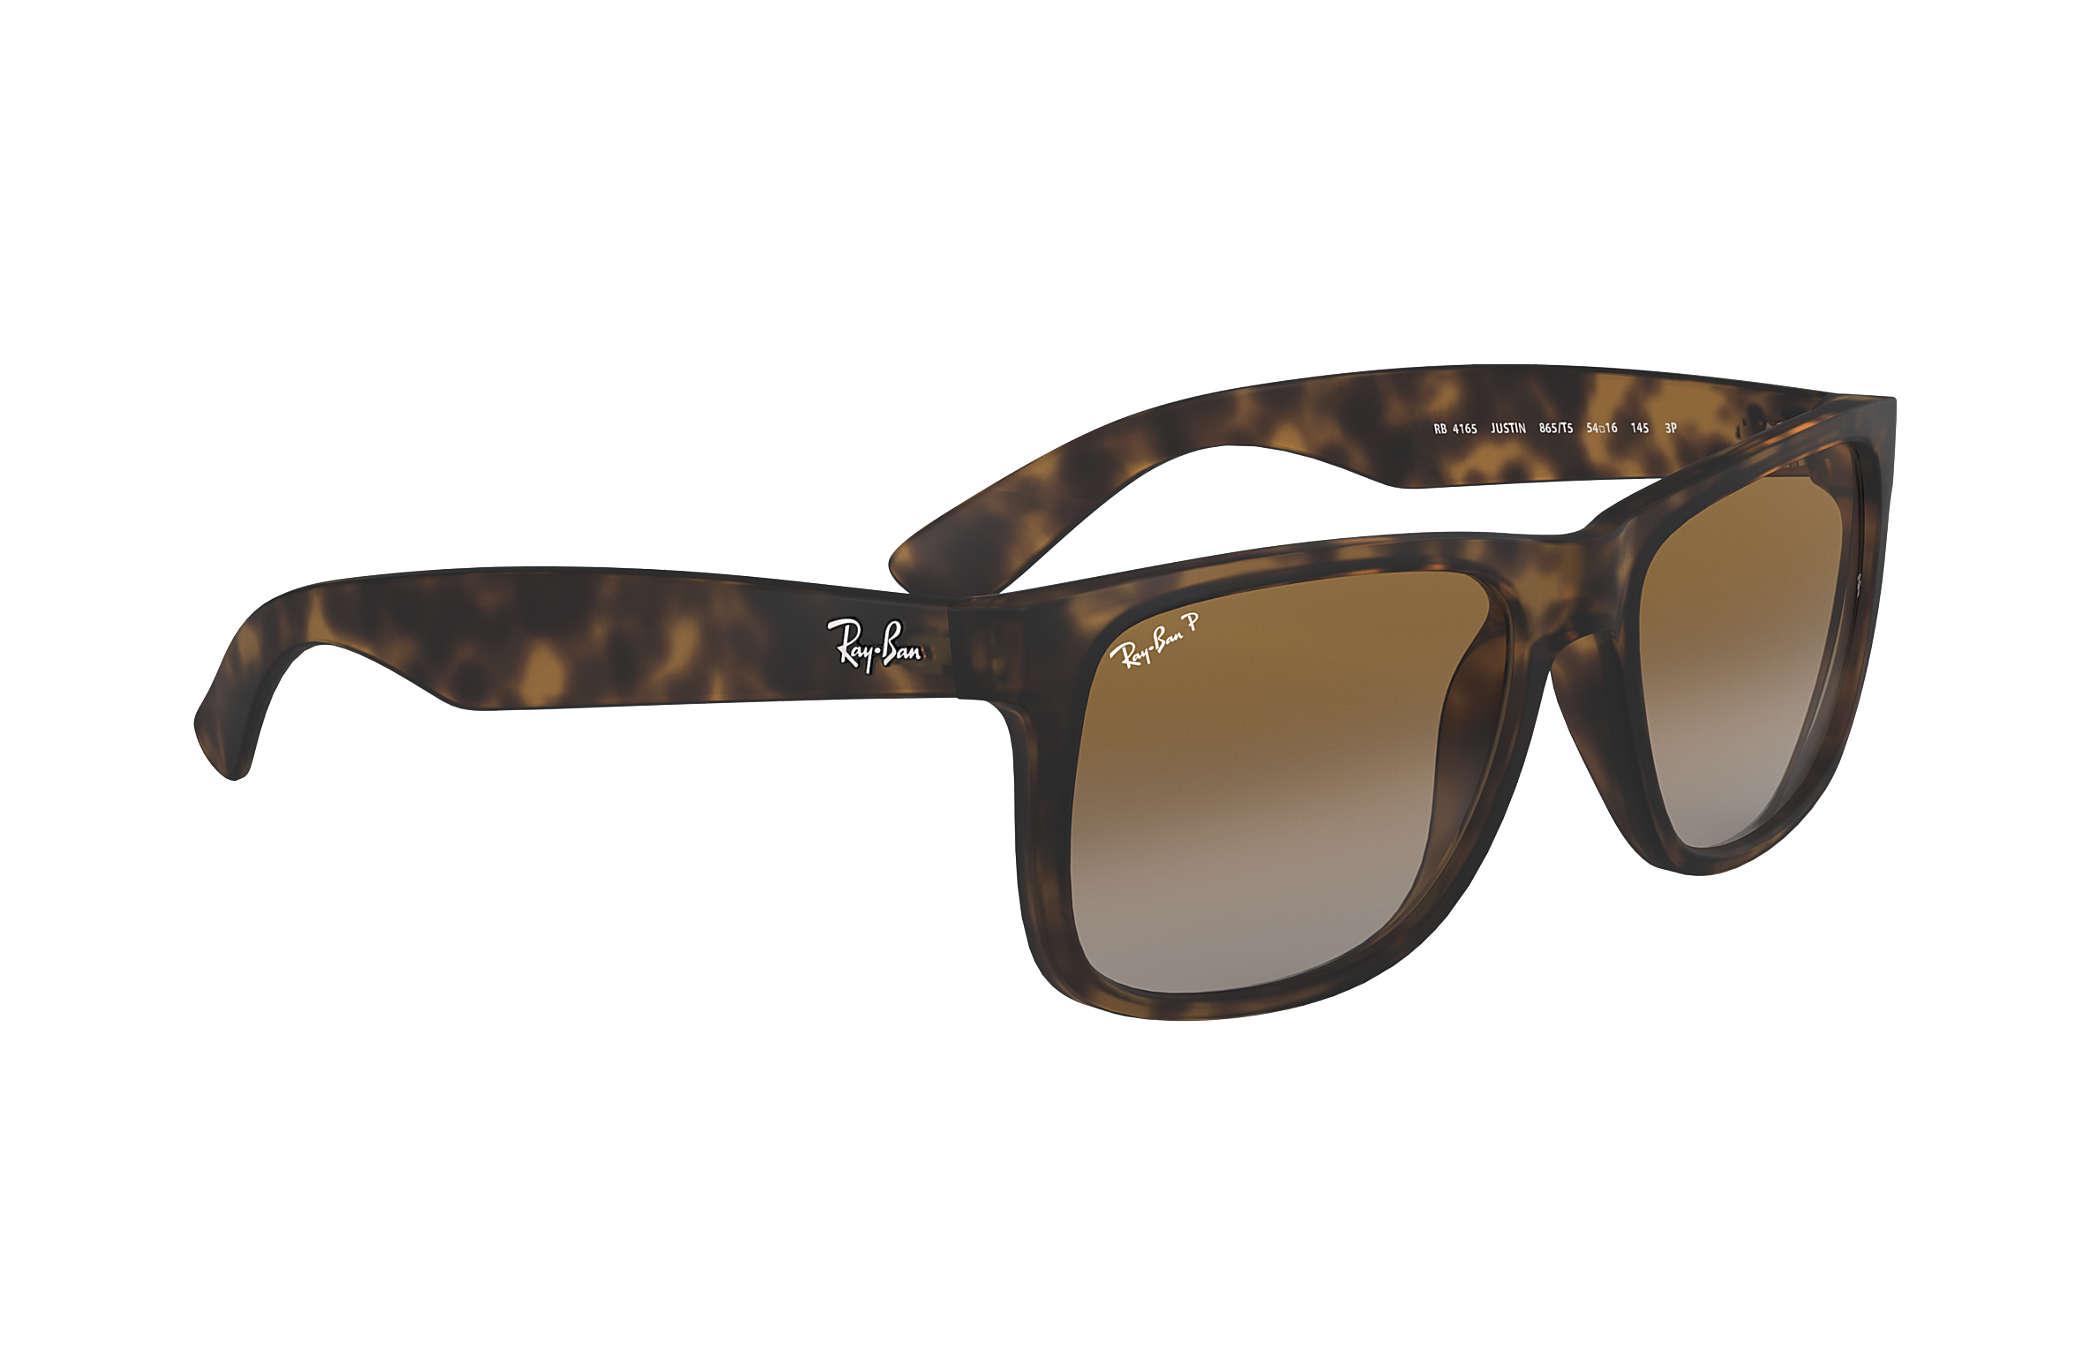 fe5ba3470d Ray-Ban Justin Classic RB4165 Tortoise - Nylon - Brown Polarized ...